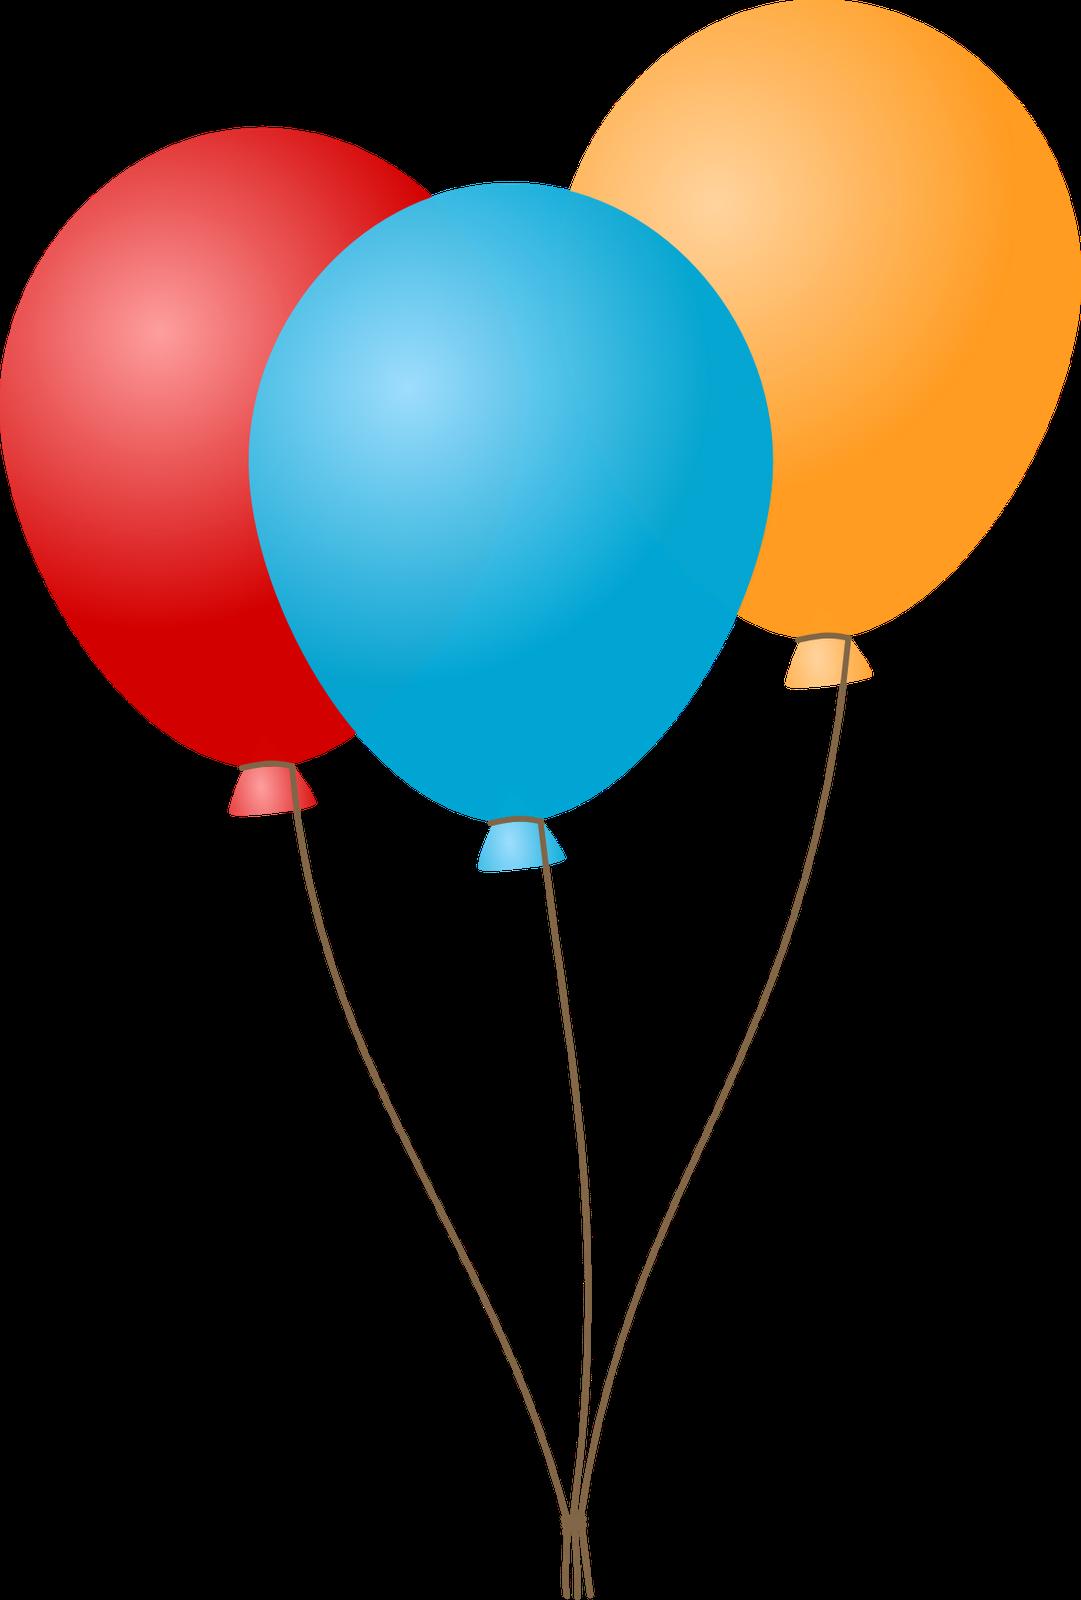 Cartoon Birthday Balloons Clip Art N5 free image.